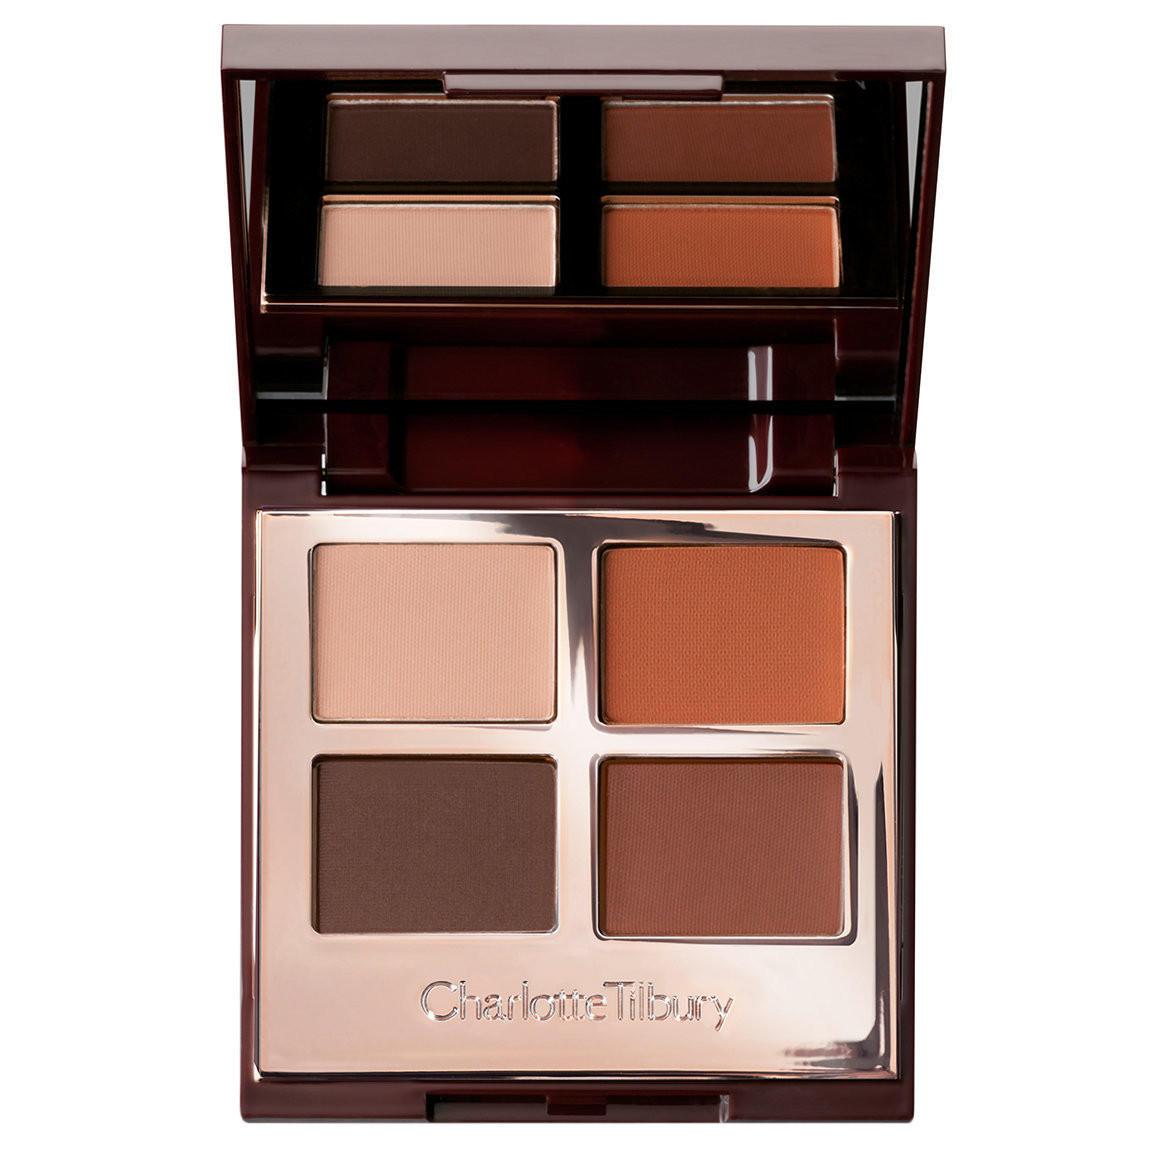 Charlotte Tilbury Luxury Eyeshadow Palette Desert Haze